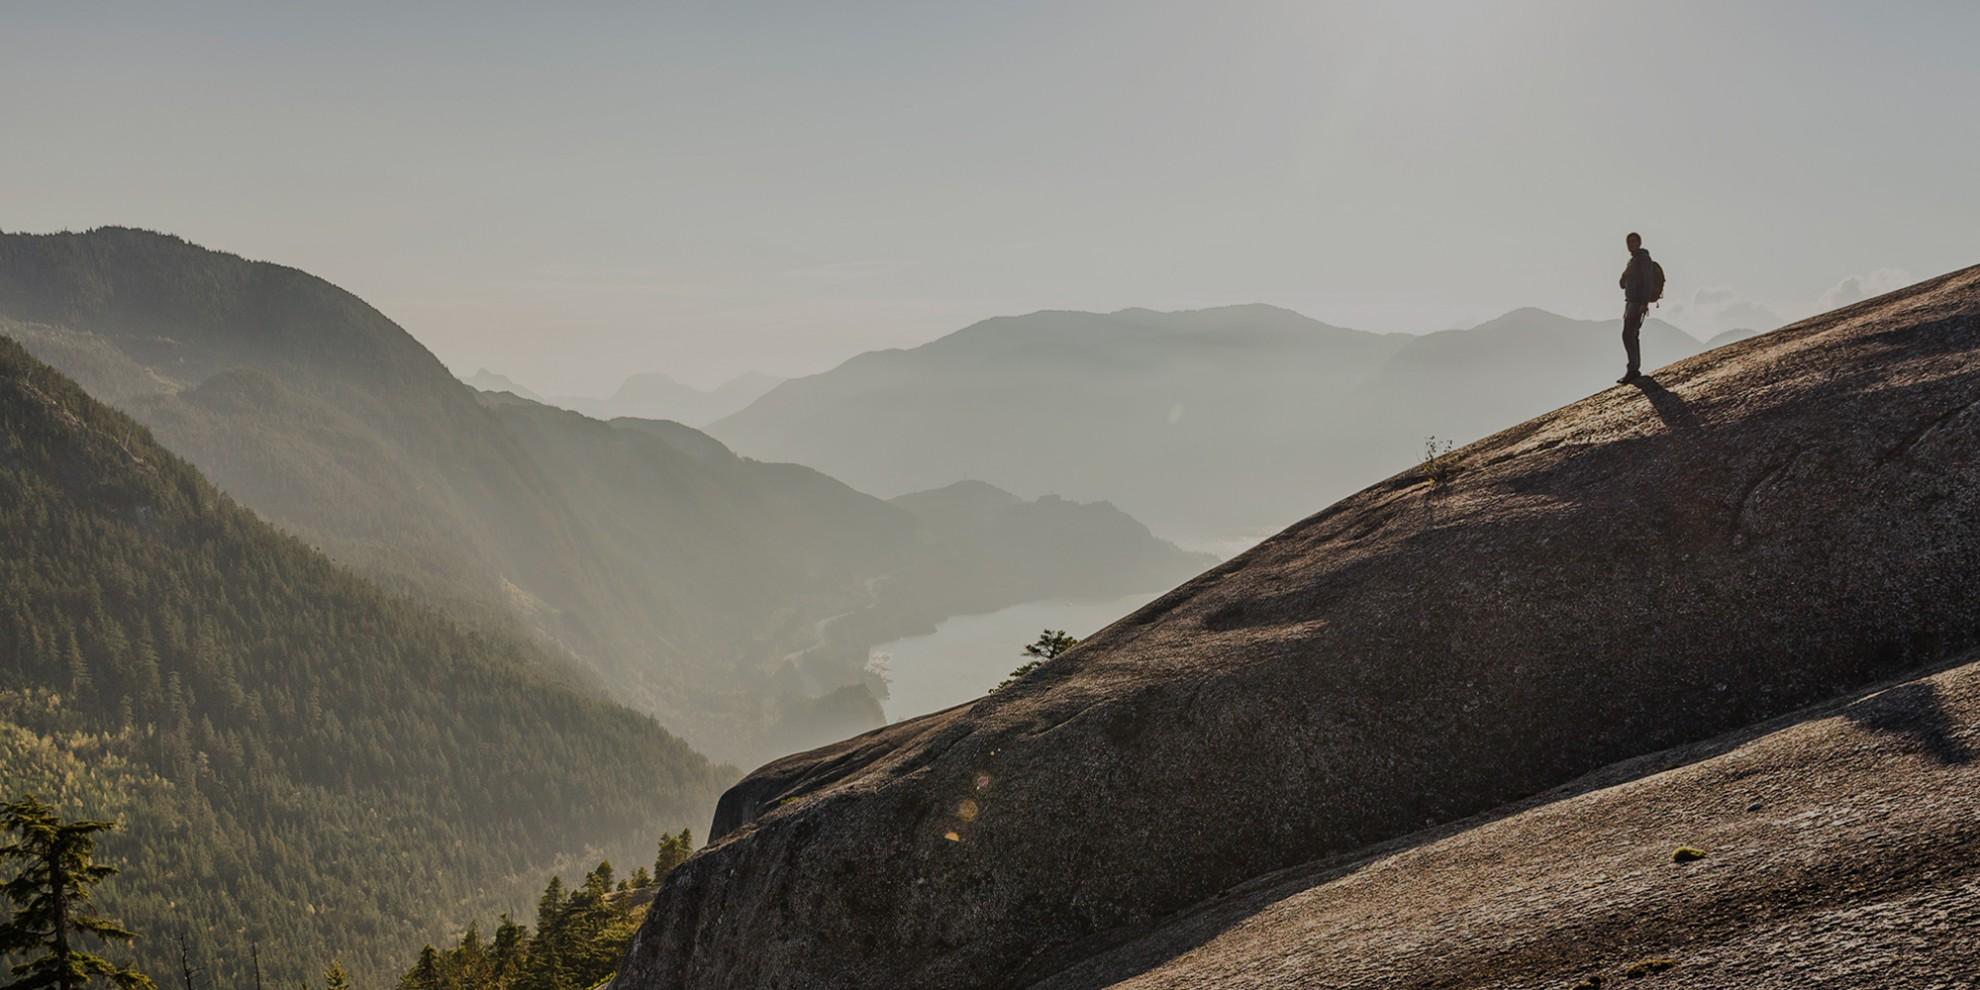 Wanderer auf Felsmassiv inmitten einsamer Berglandschaft